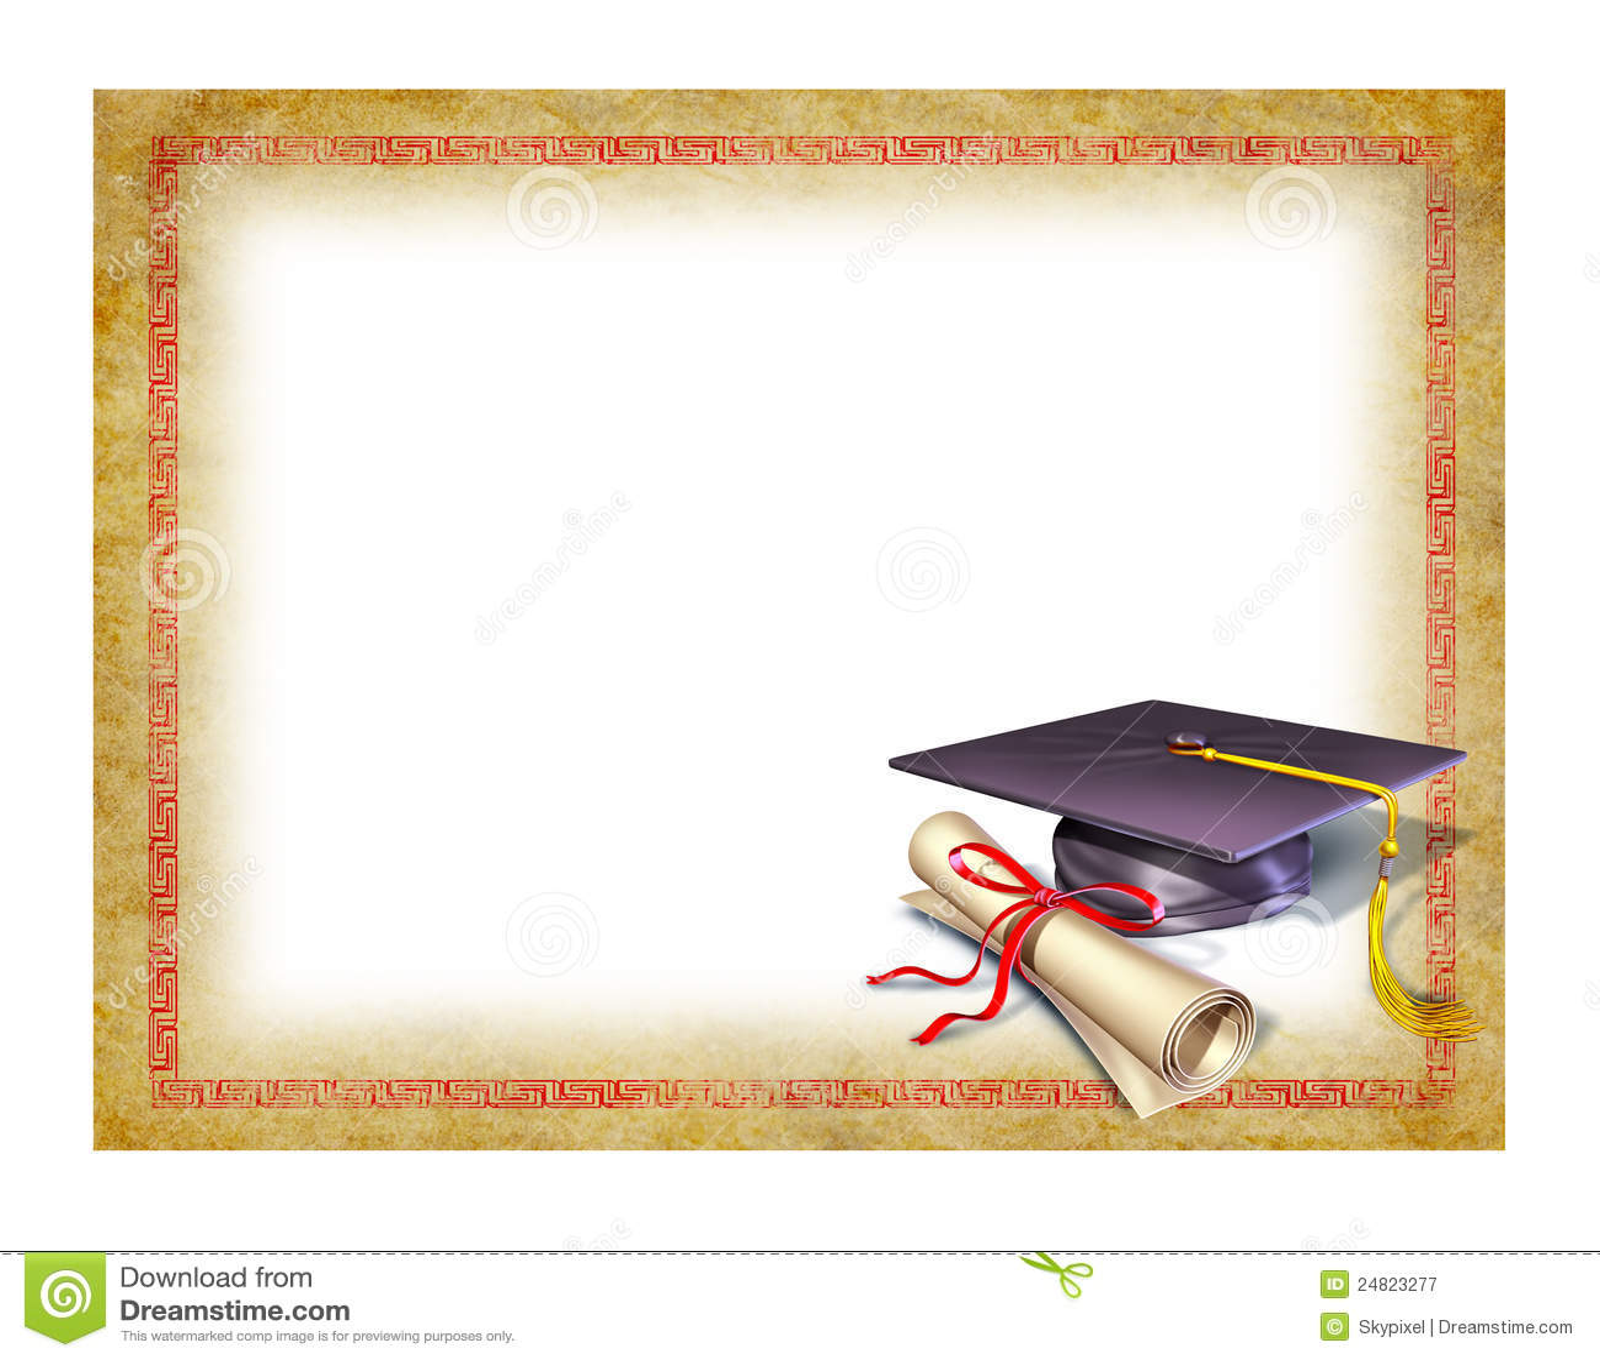 Blank Graduation Diploma